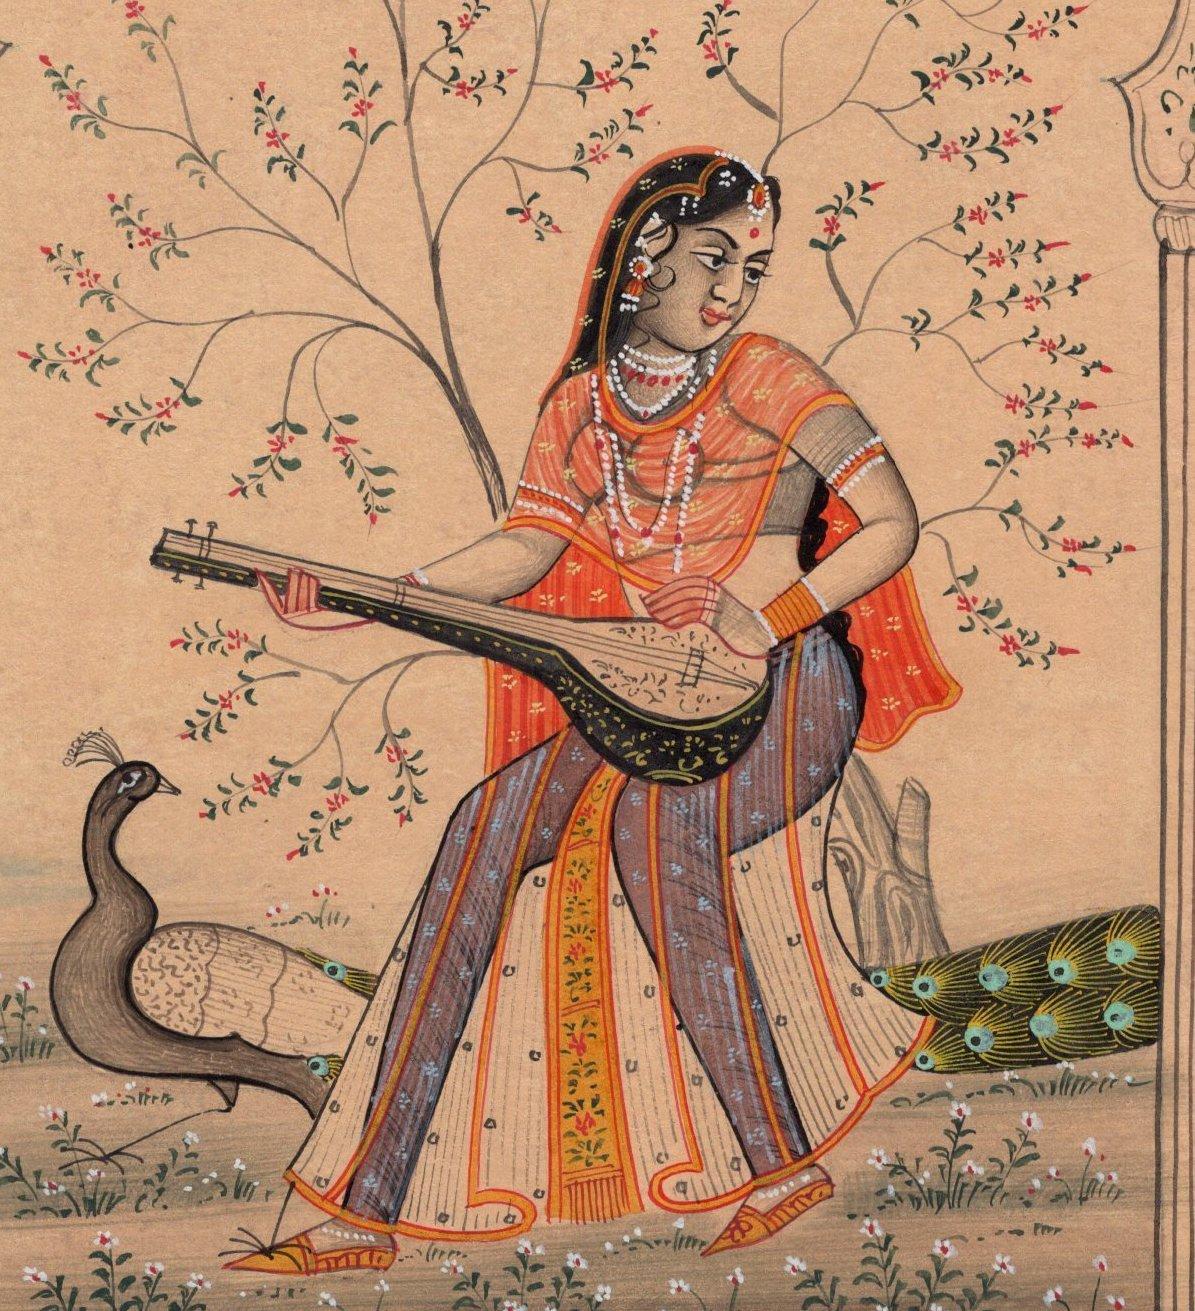 Rajasthan Ragini Ragamala Painting Indian Handmade Ethnic